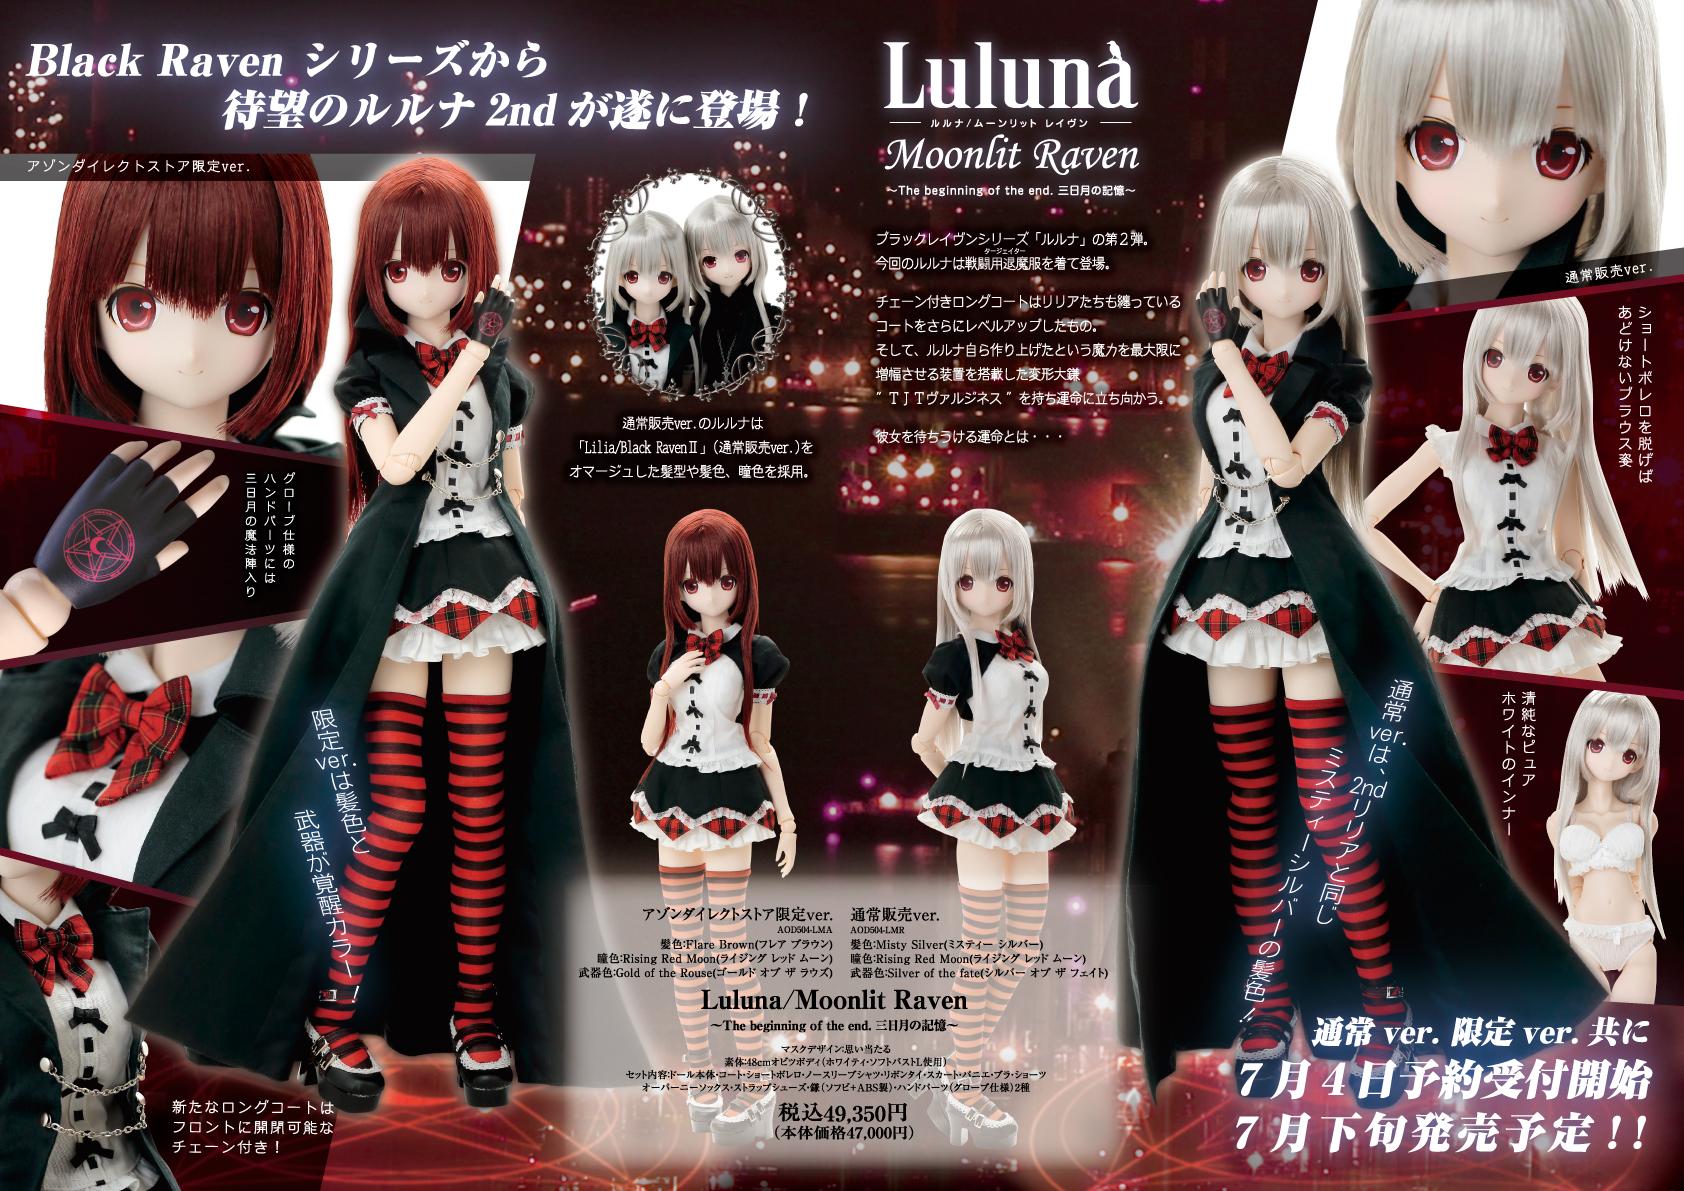 Luluna/Moonlit Raven ~The beginning of the end. 三日月の記憶~